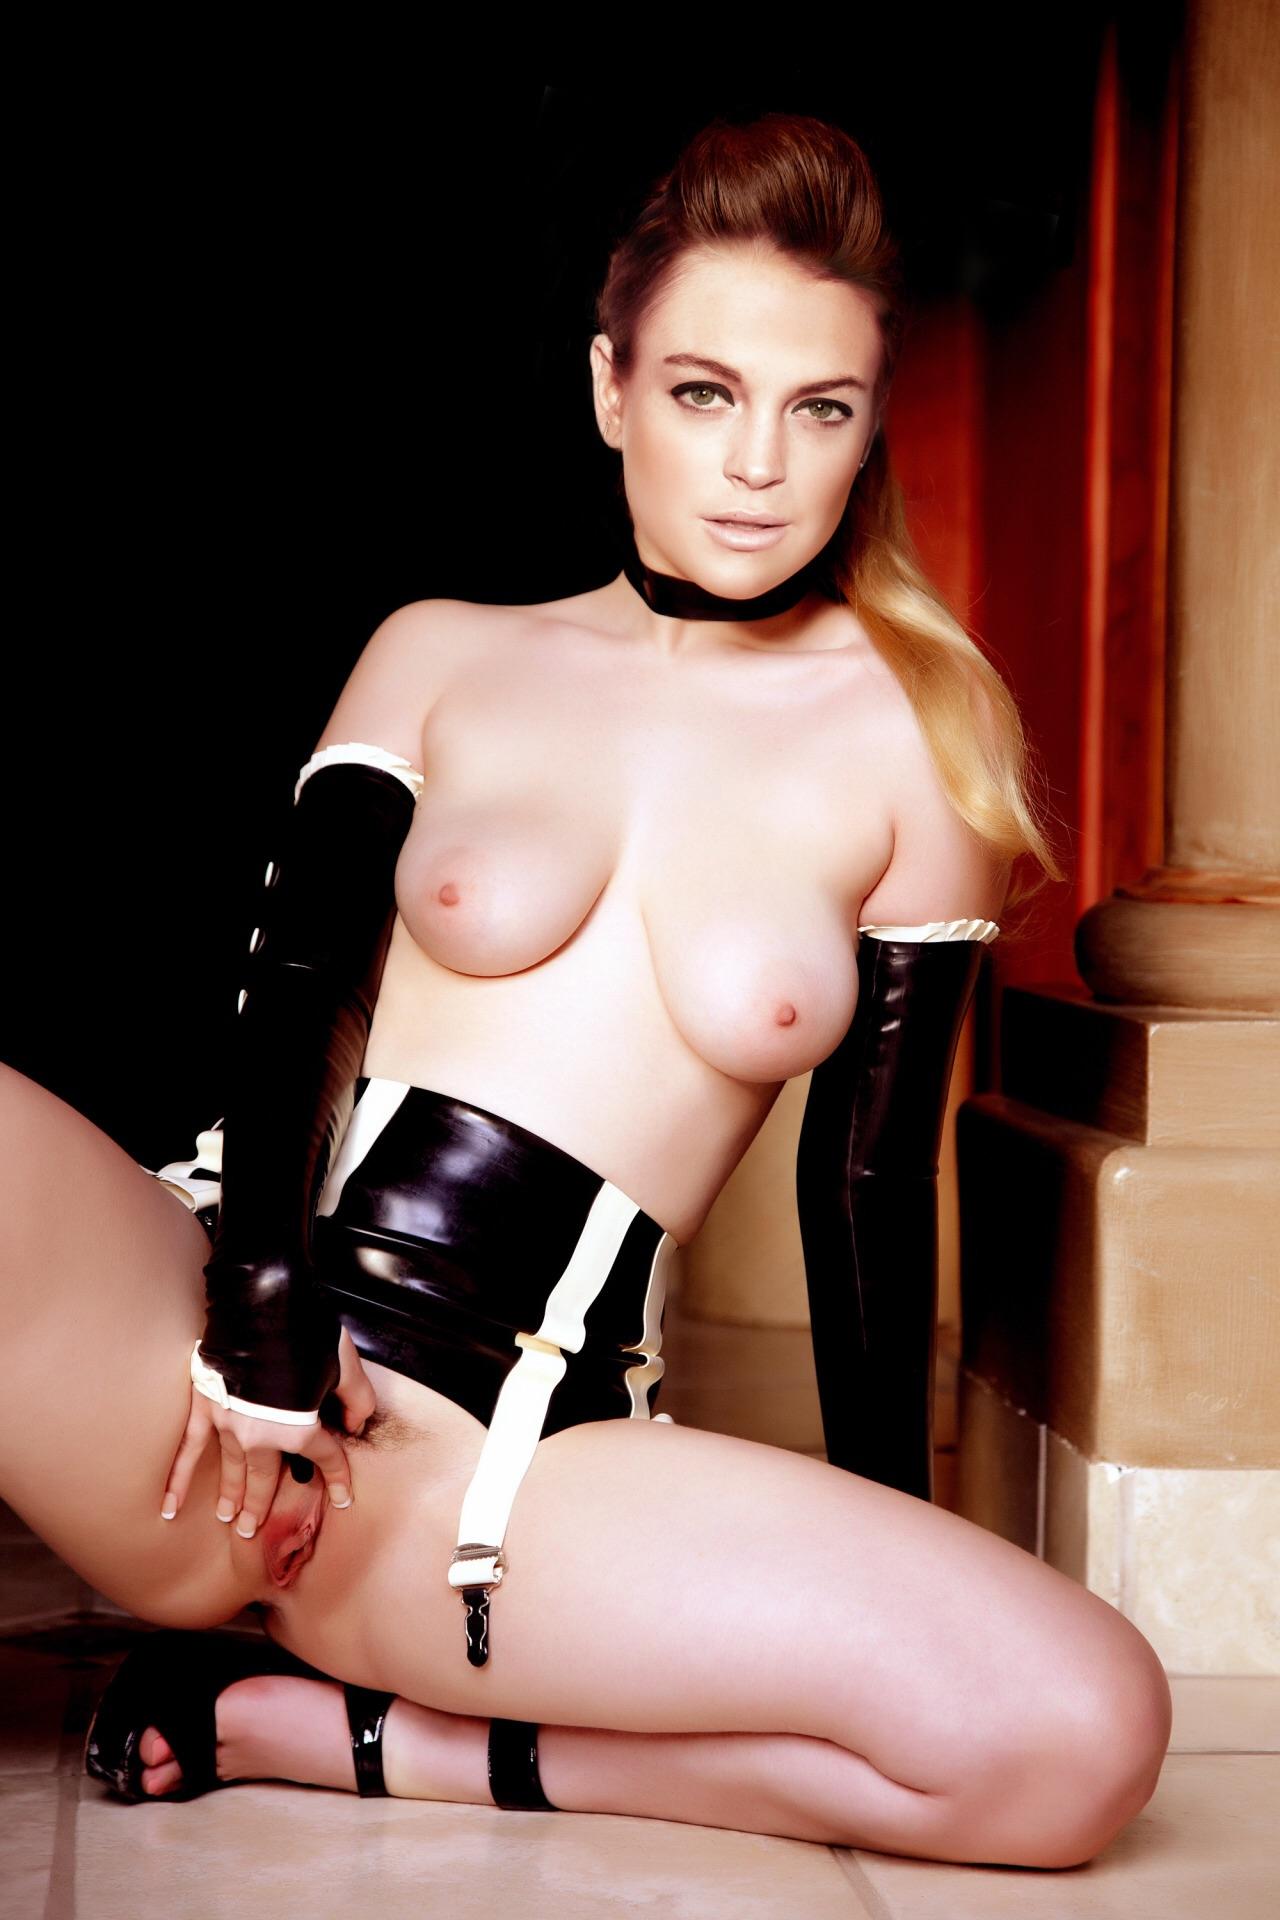 Nude petite white women